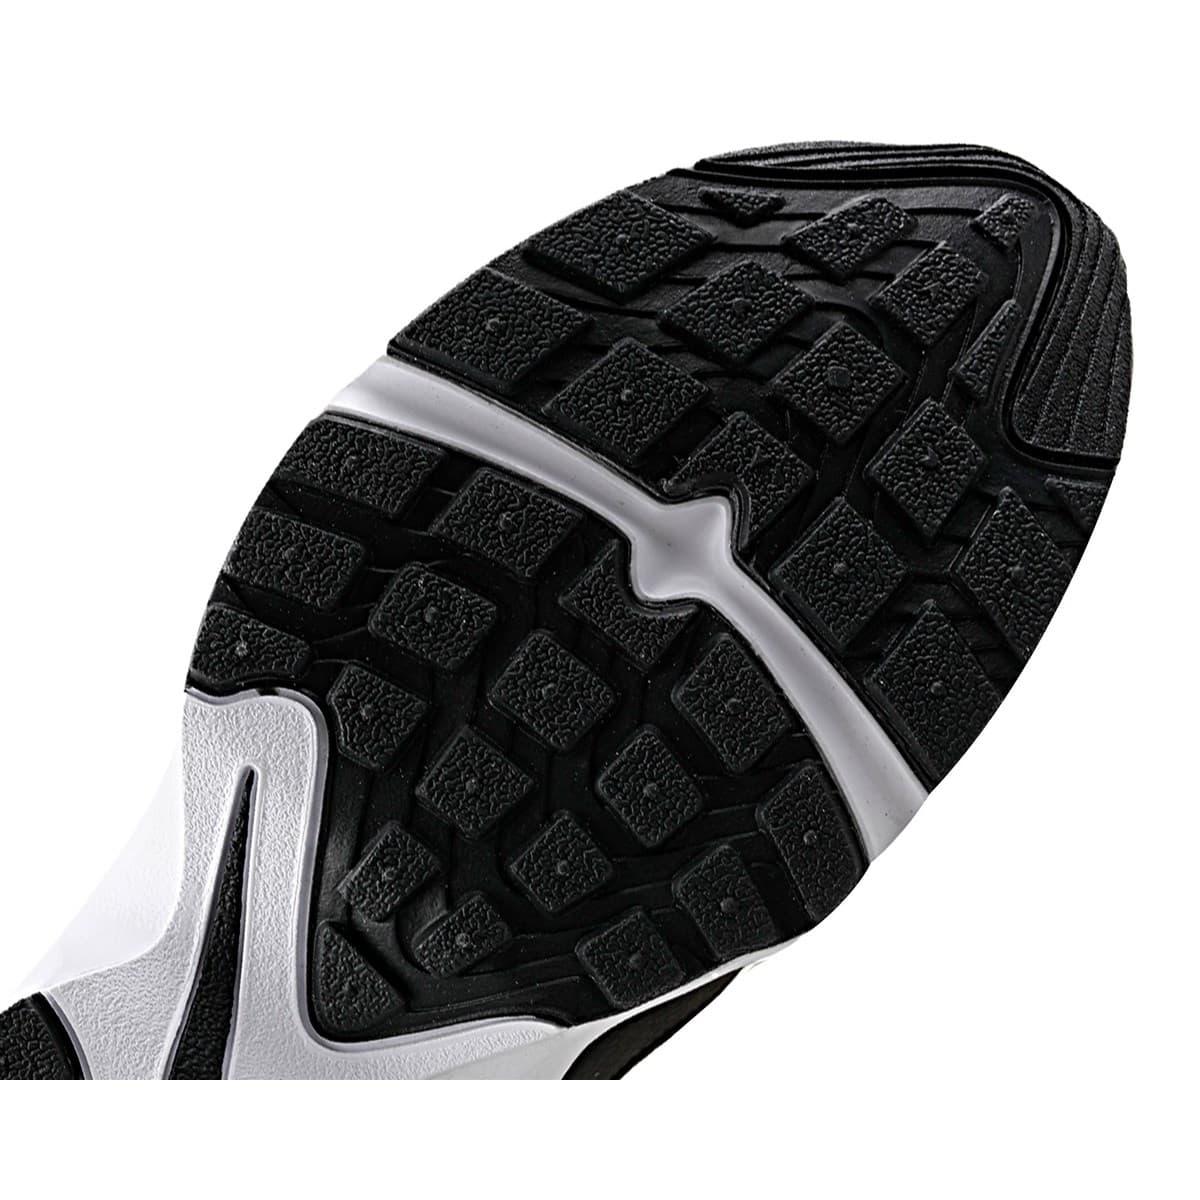 Air Heights Siyah Erkek Koşu Ayakkabısı